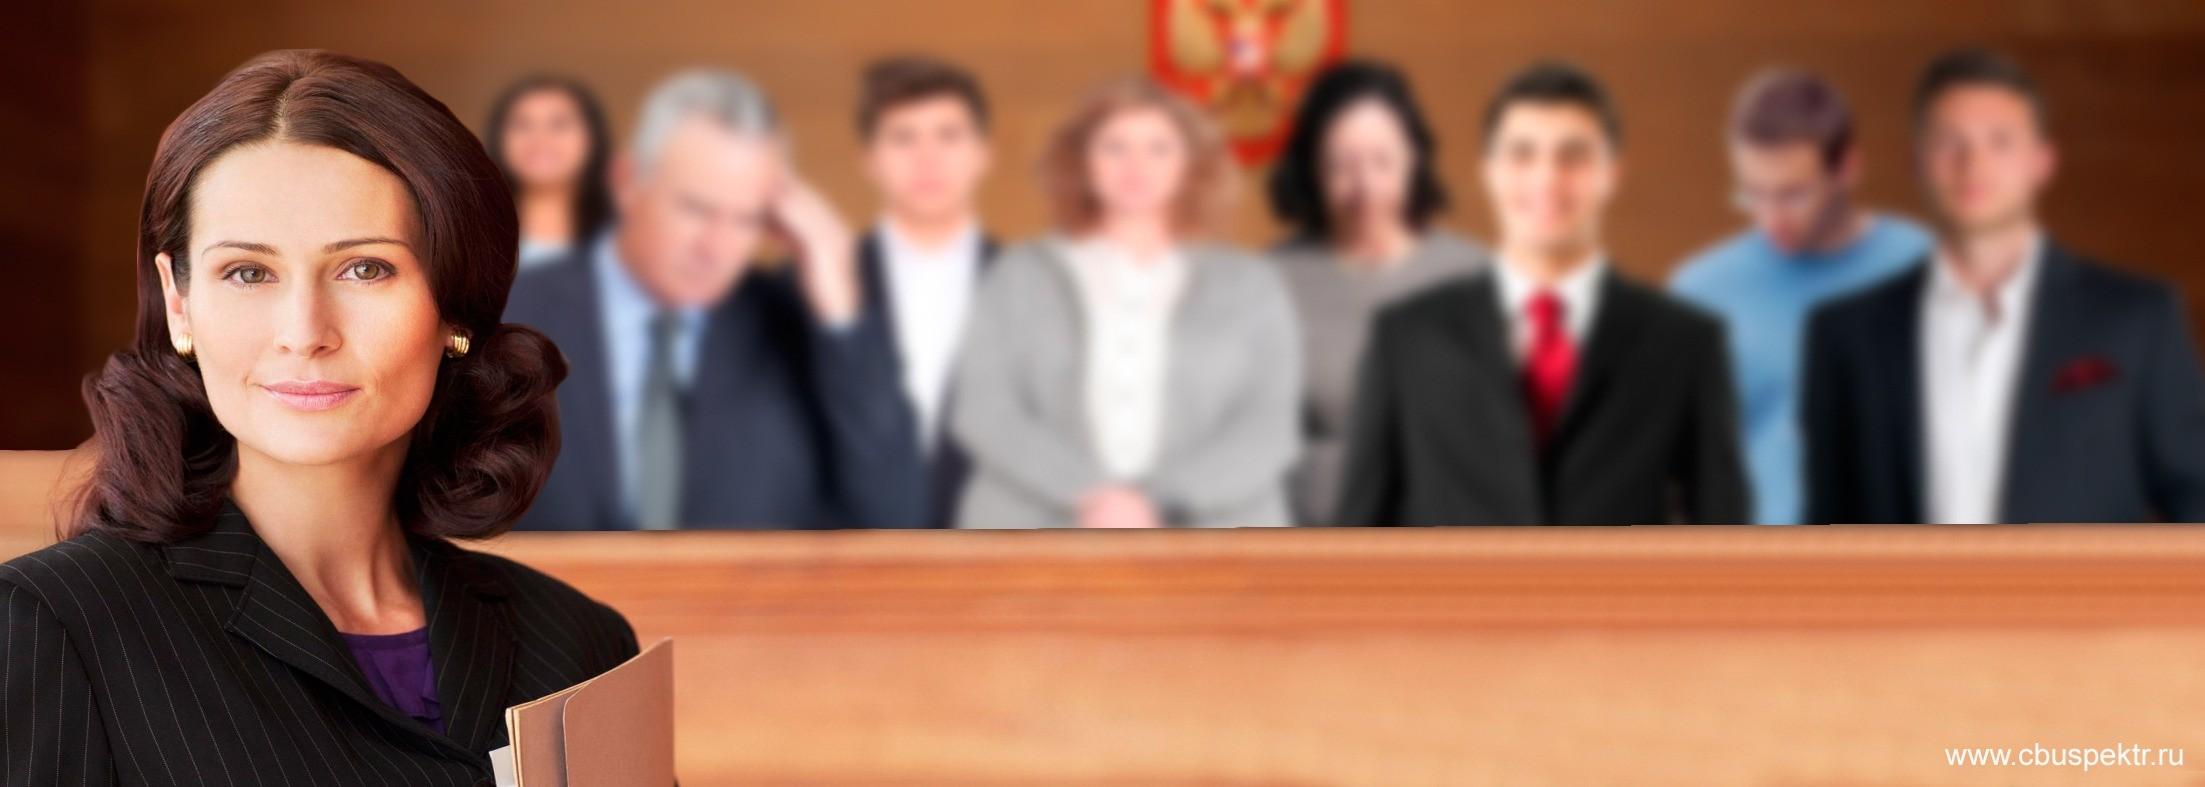 Юрист на фоне клиентов